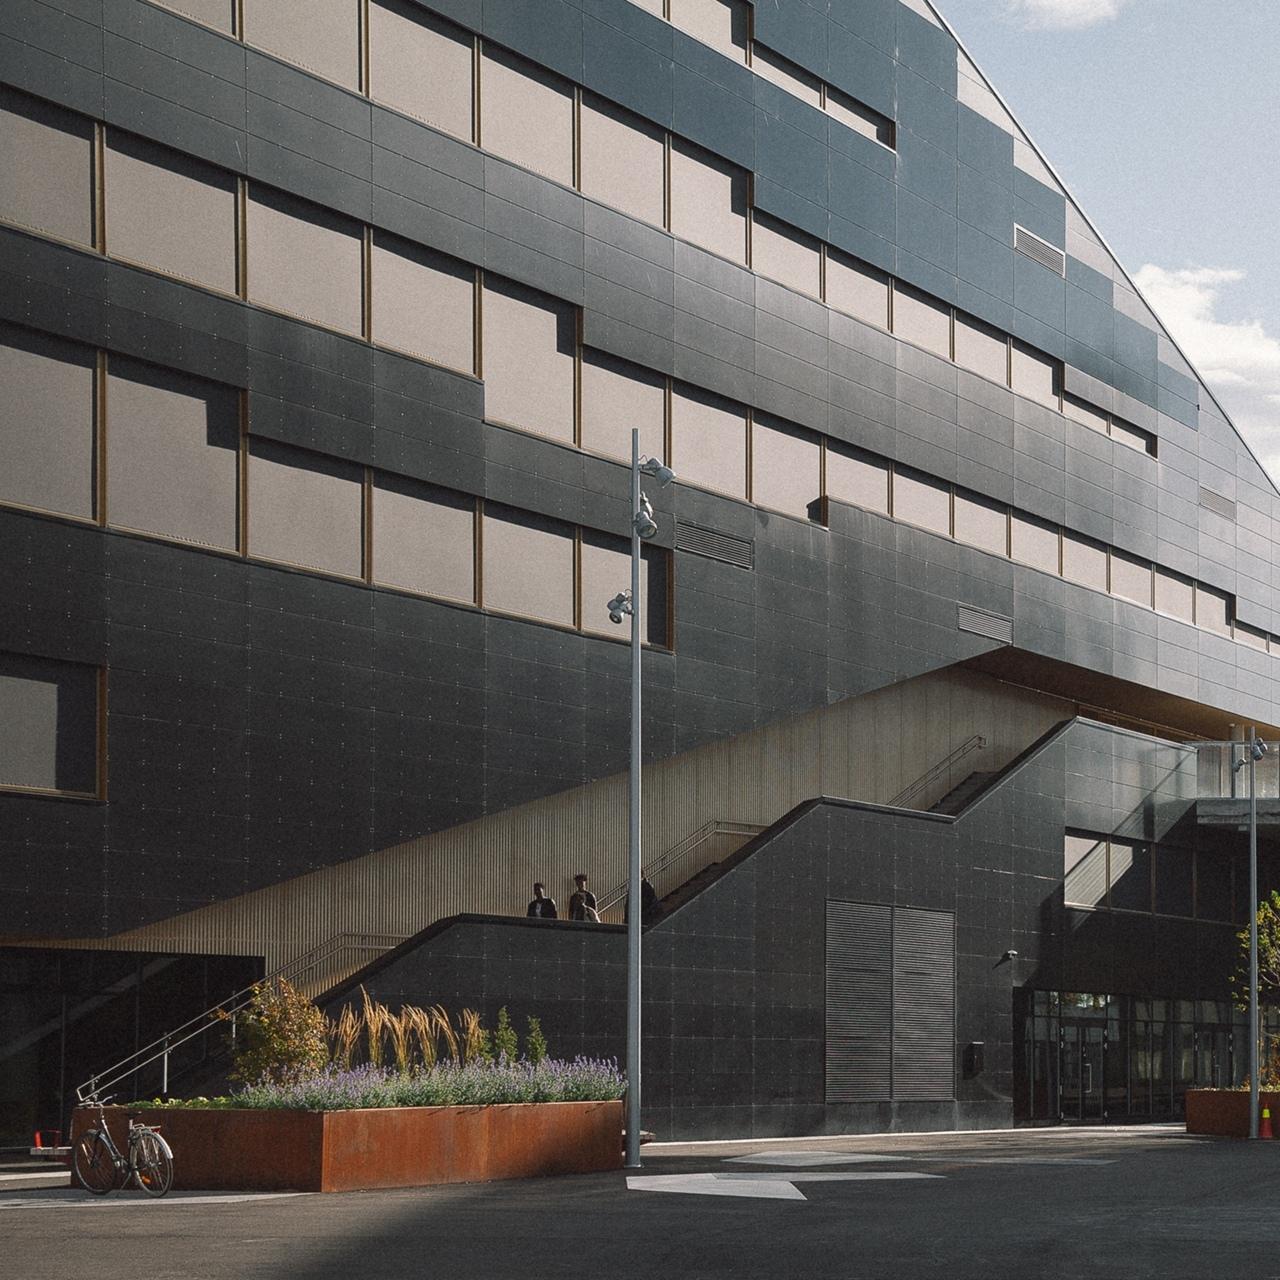 Powerhouse Brattørkaia (2012-2019) от архитектурного бюро Snøhetta